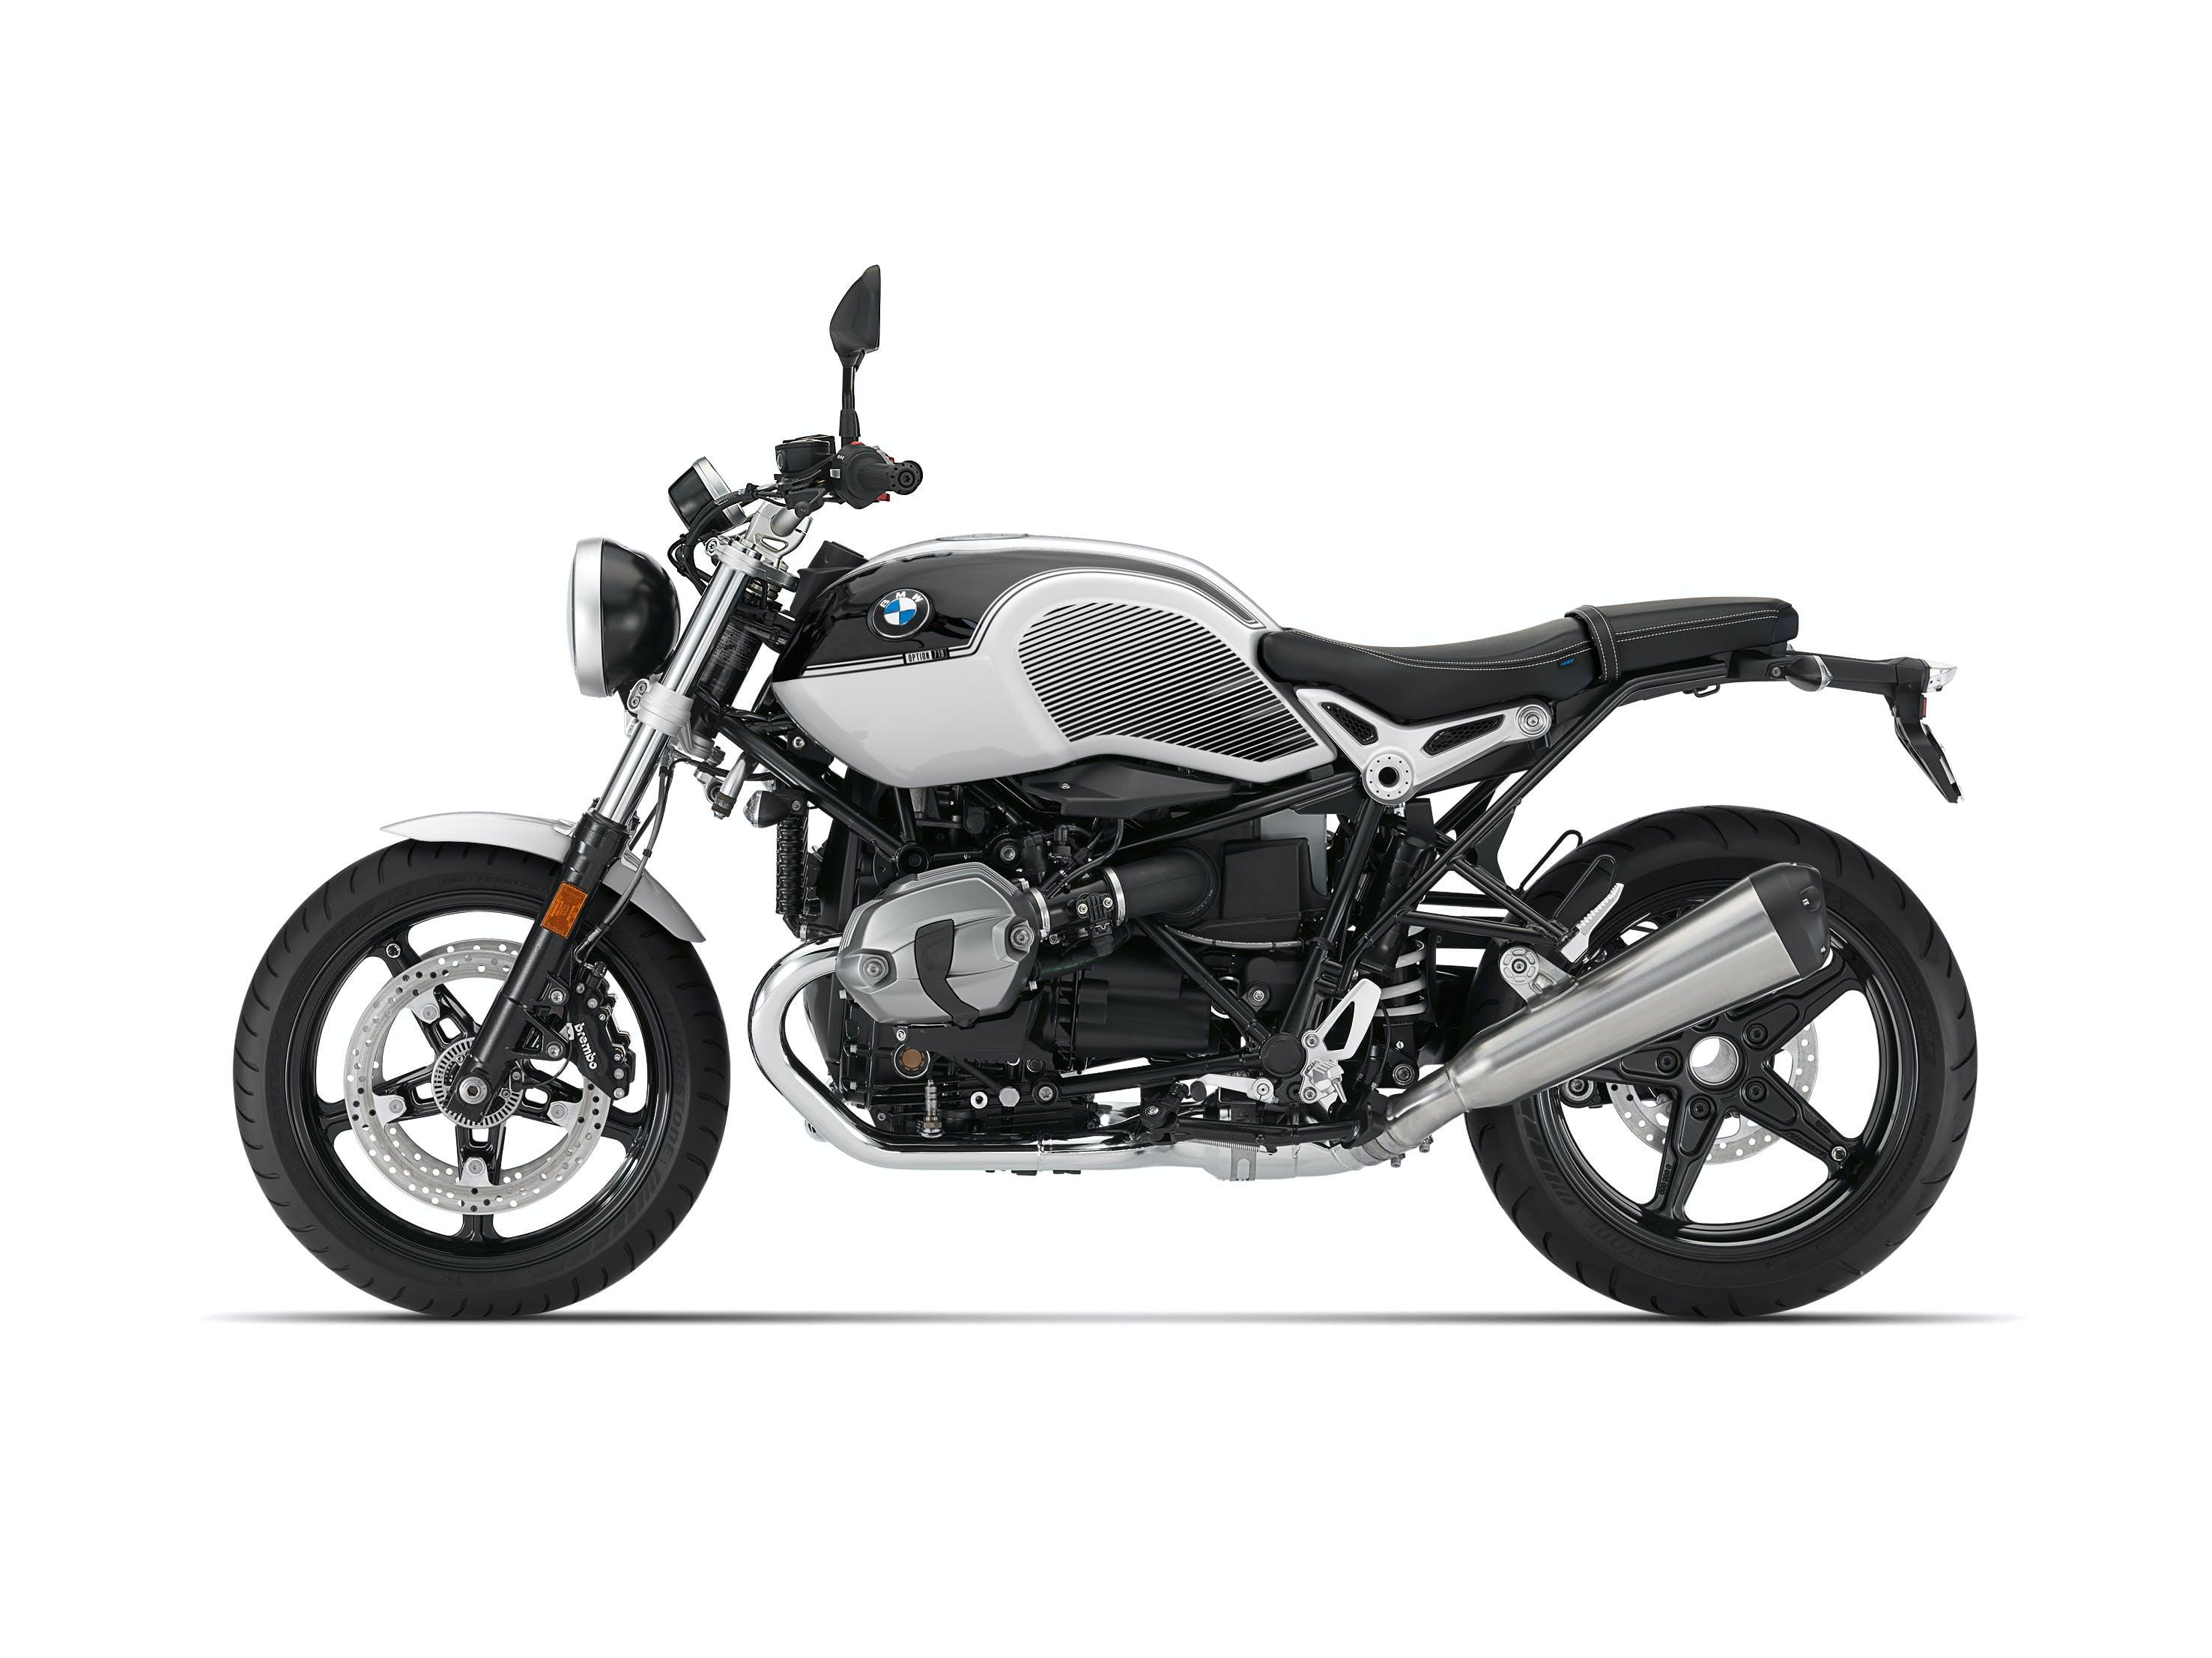 BMW R NINET PURE SPEZIAL in opt 719 black storm metallic / light white colour